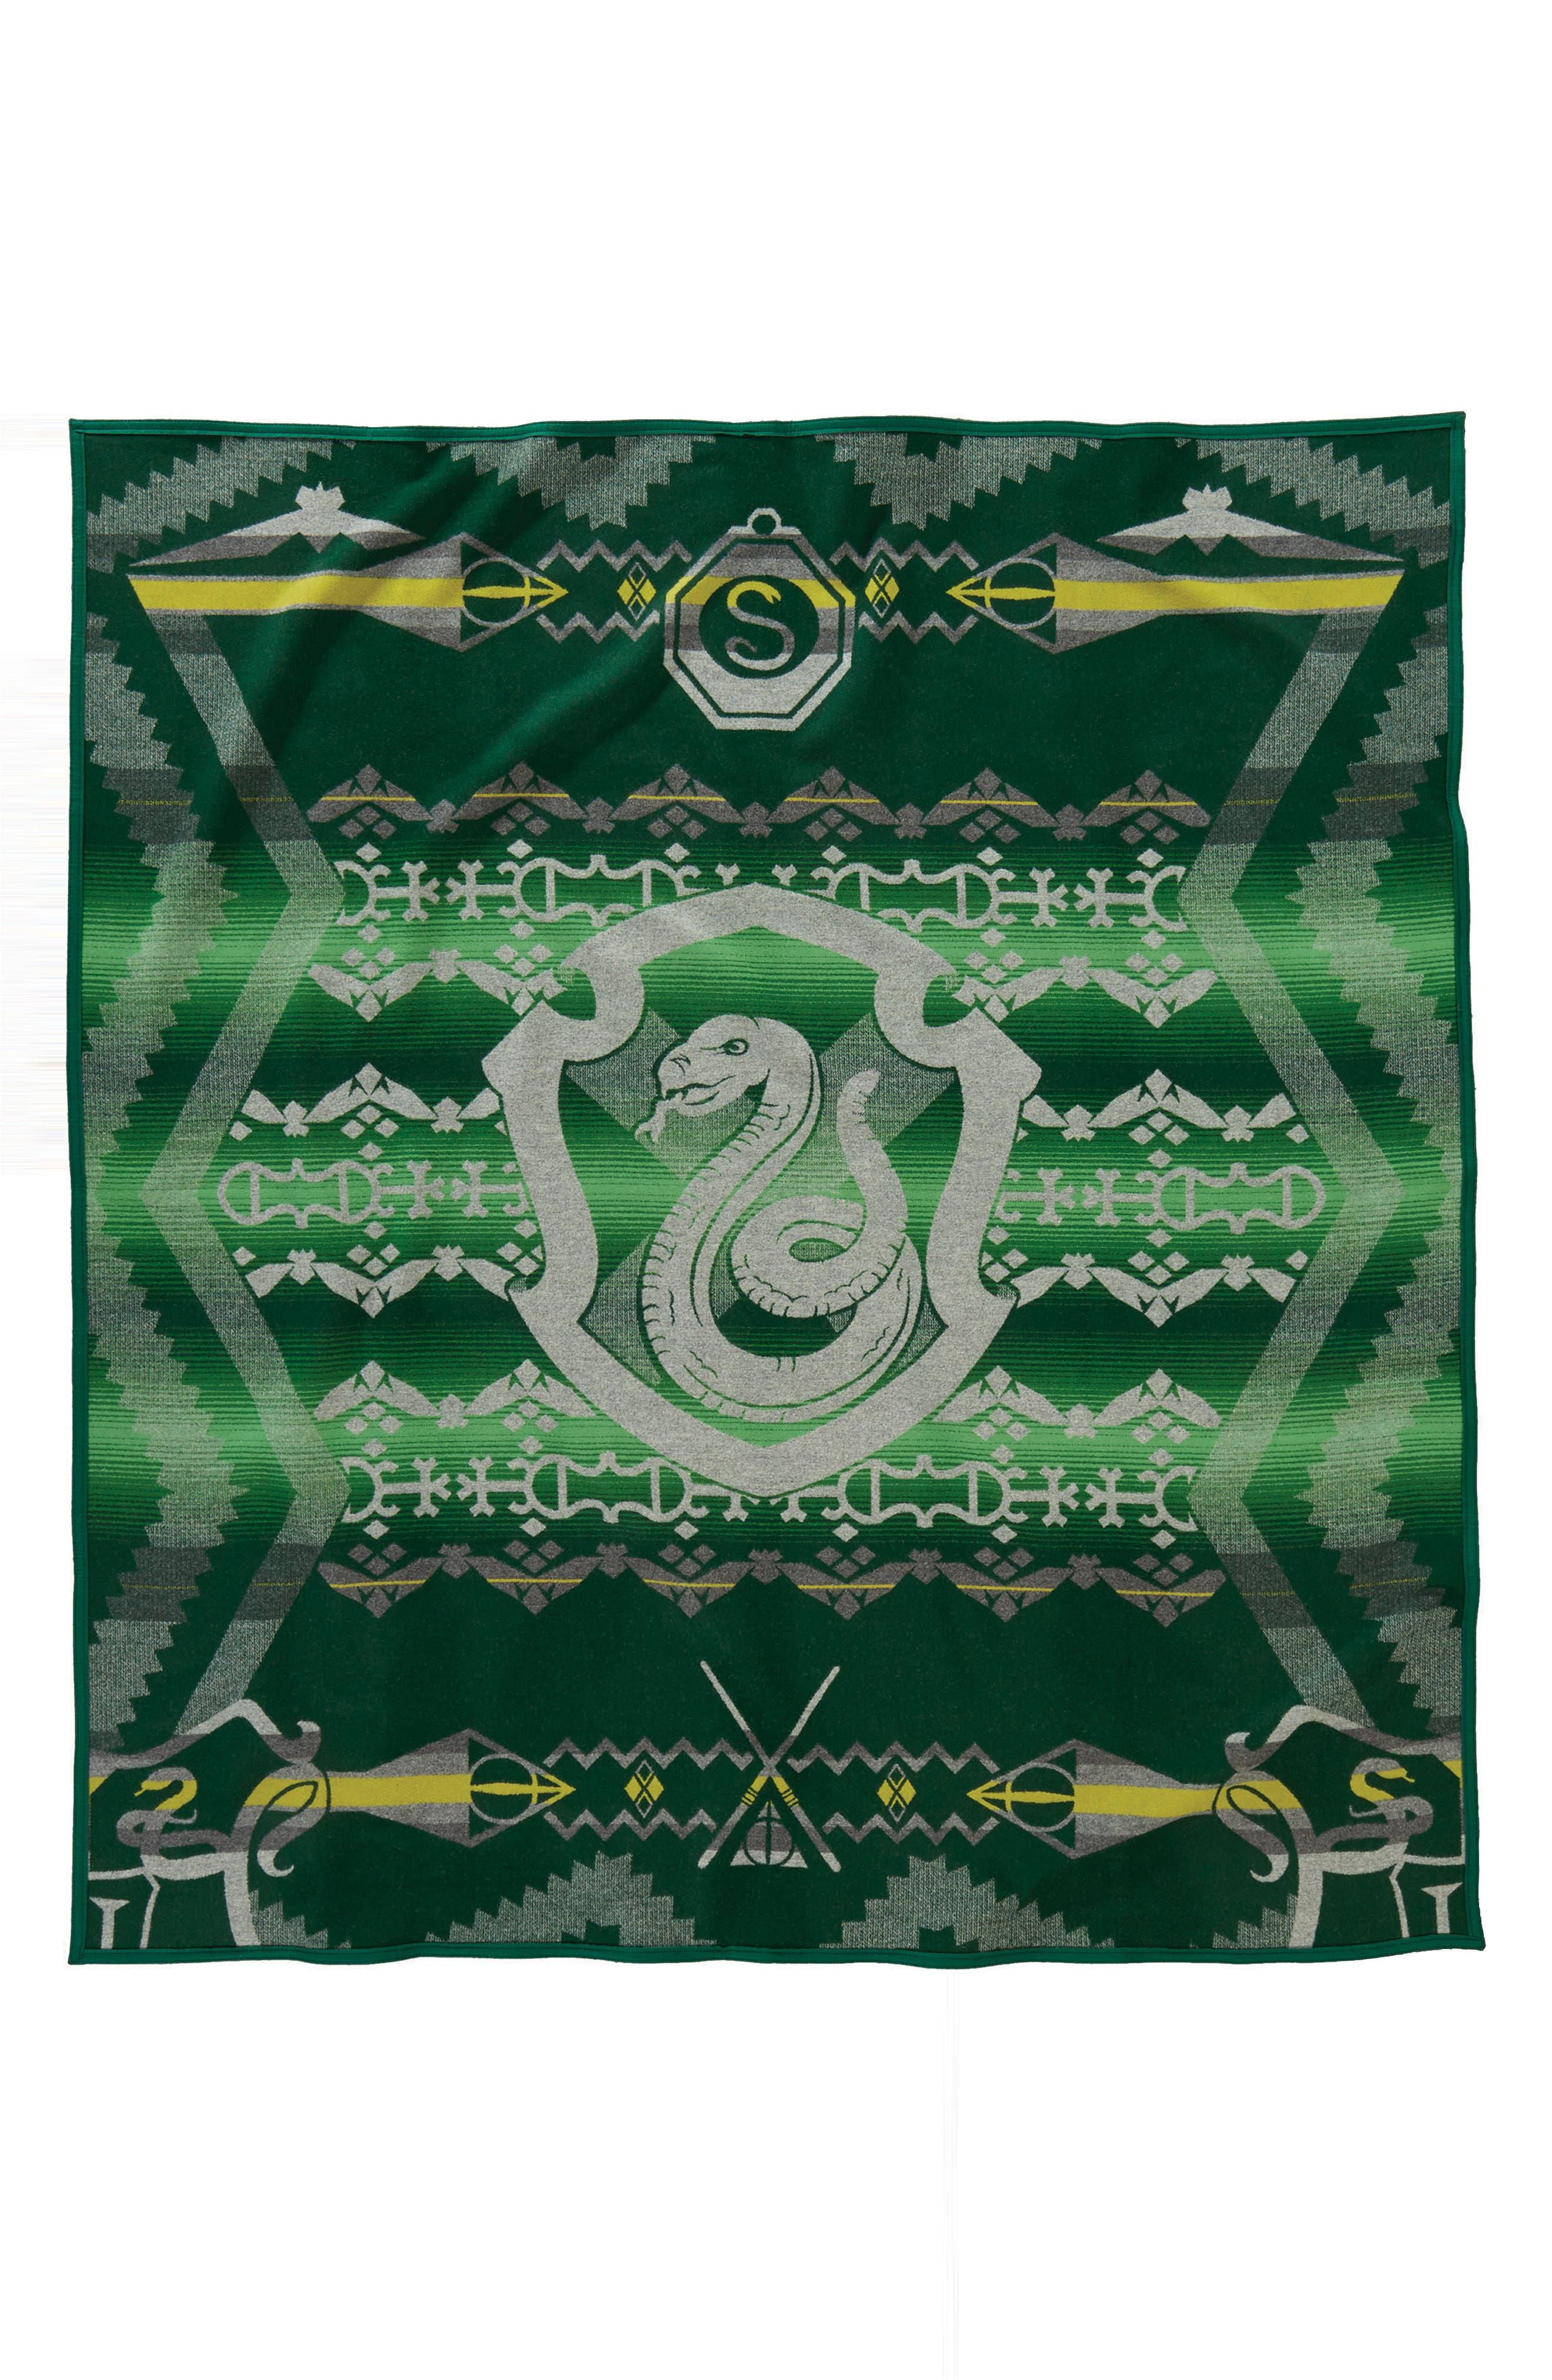 Harry Potter - Slytherin Blanket,                             Main thumbnail 1, color,                             Green